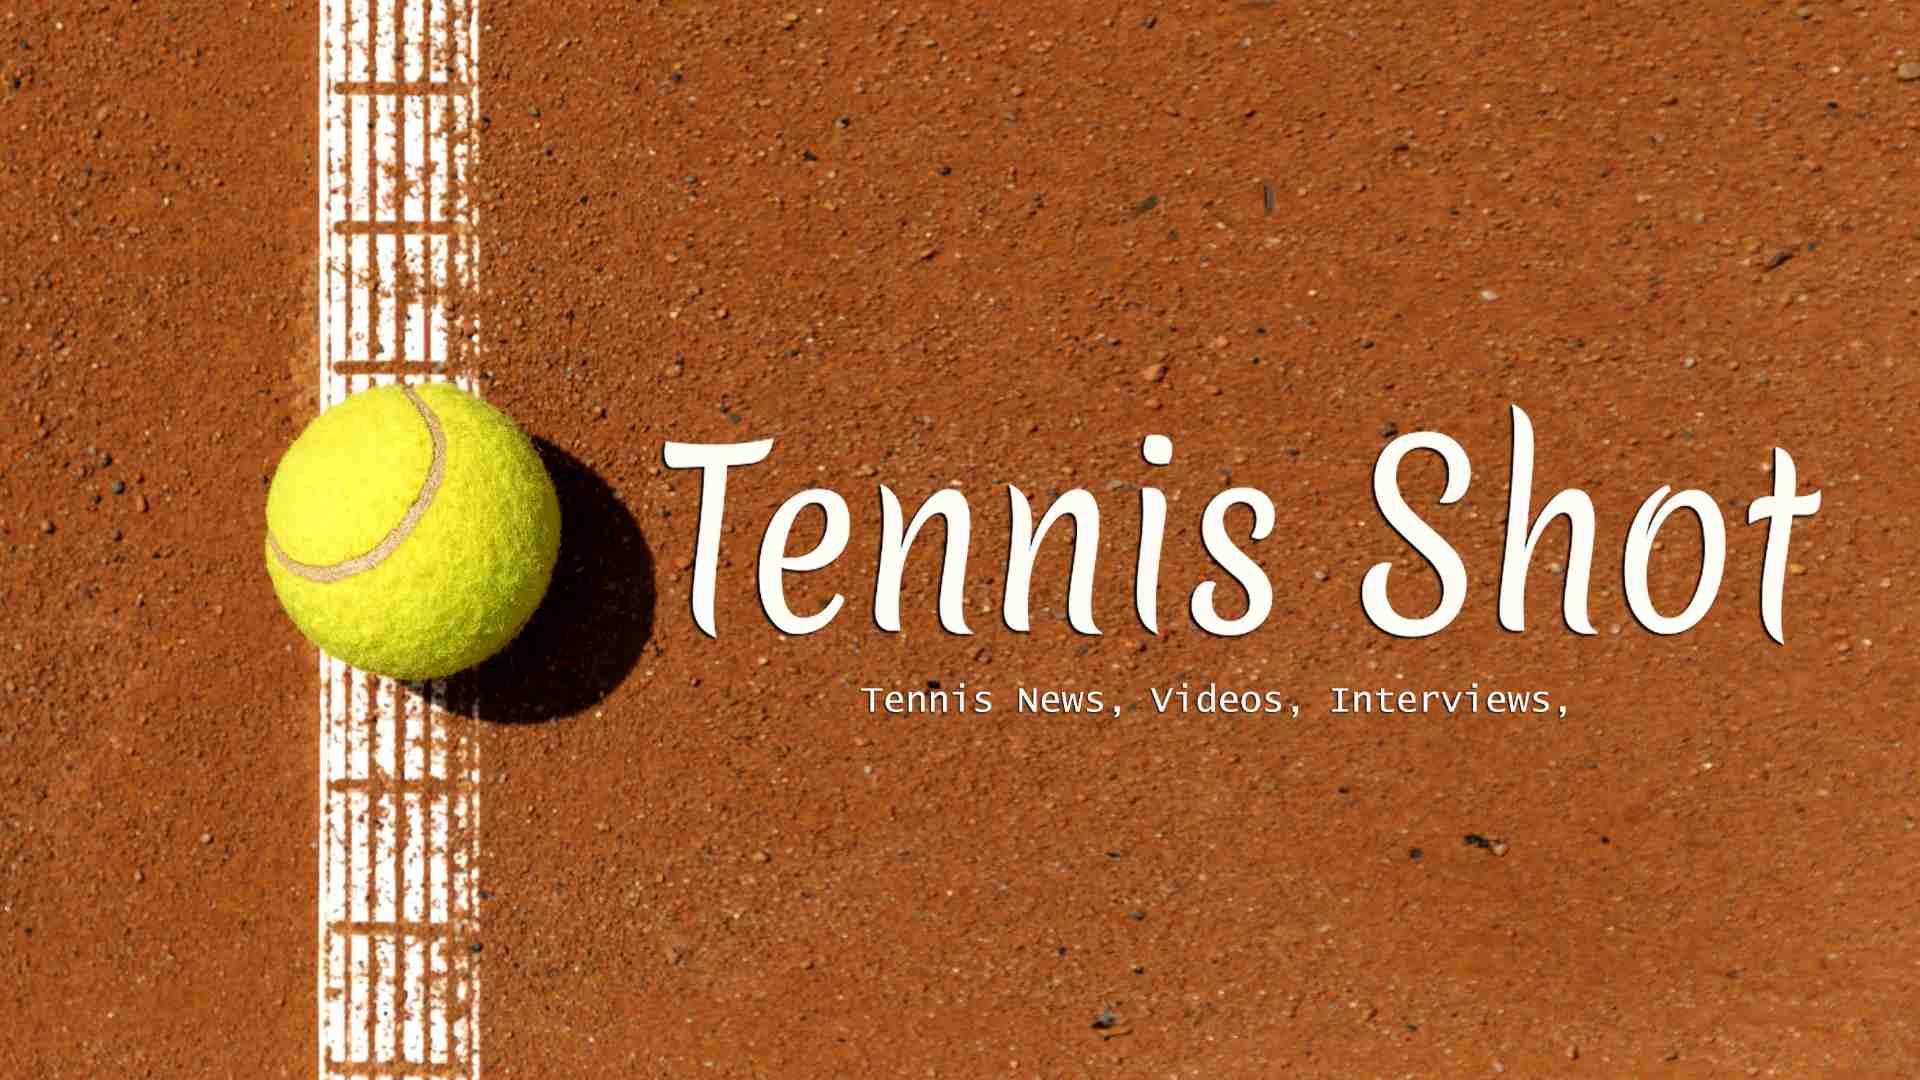 Tennis shot